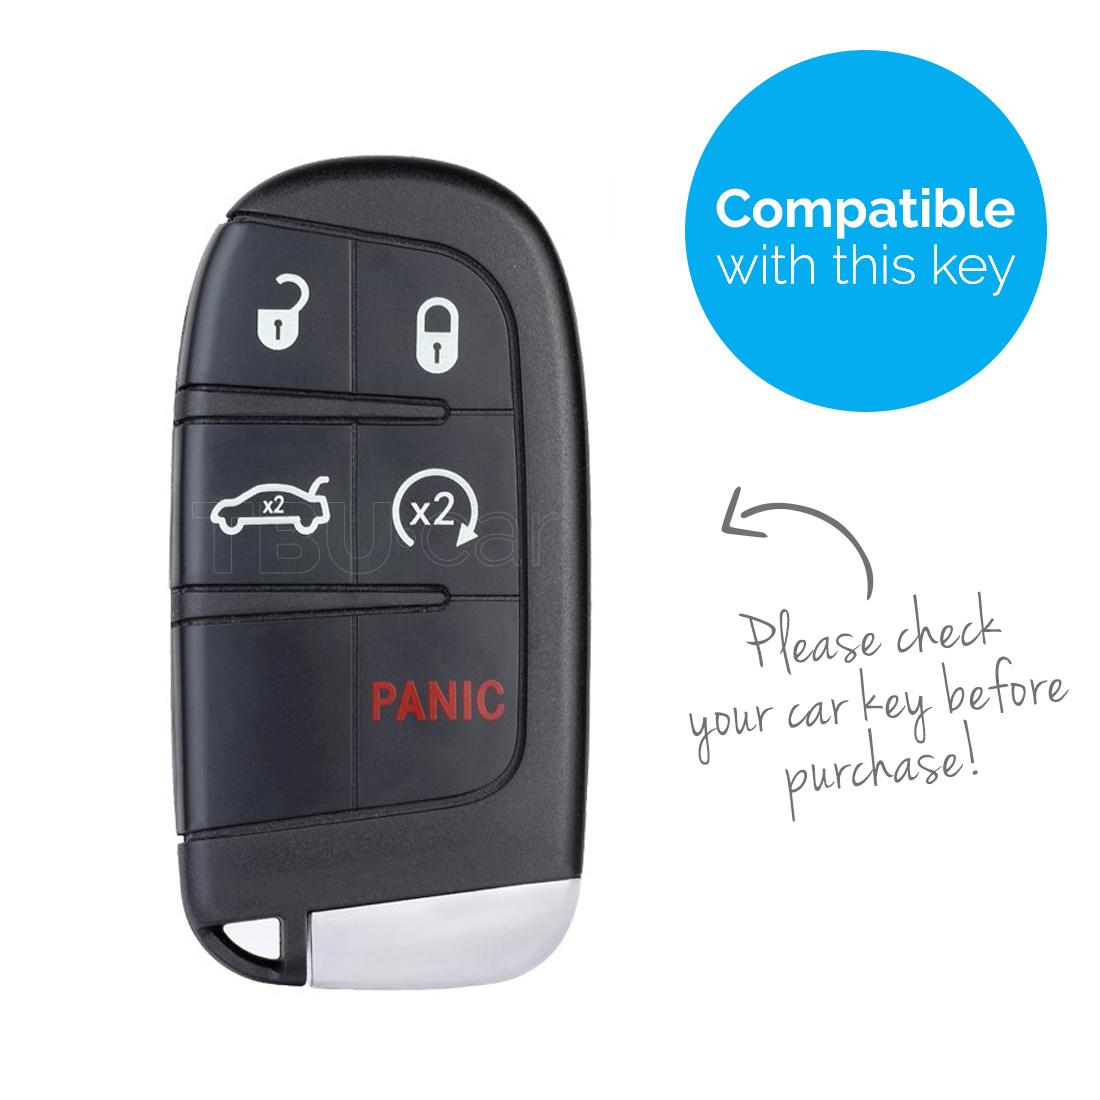 TBU car TBU car Autoschlüssel Hülle kompatibel mit Fiat 5 Tasten (Keyless Entry) - Schutzhülle aus Silikon - Auto Schlüsselhülle Cover in Hellblau